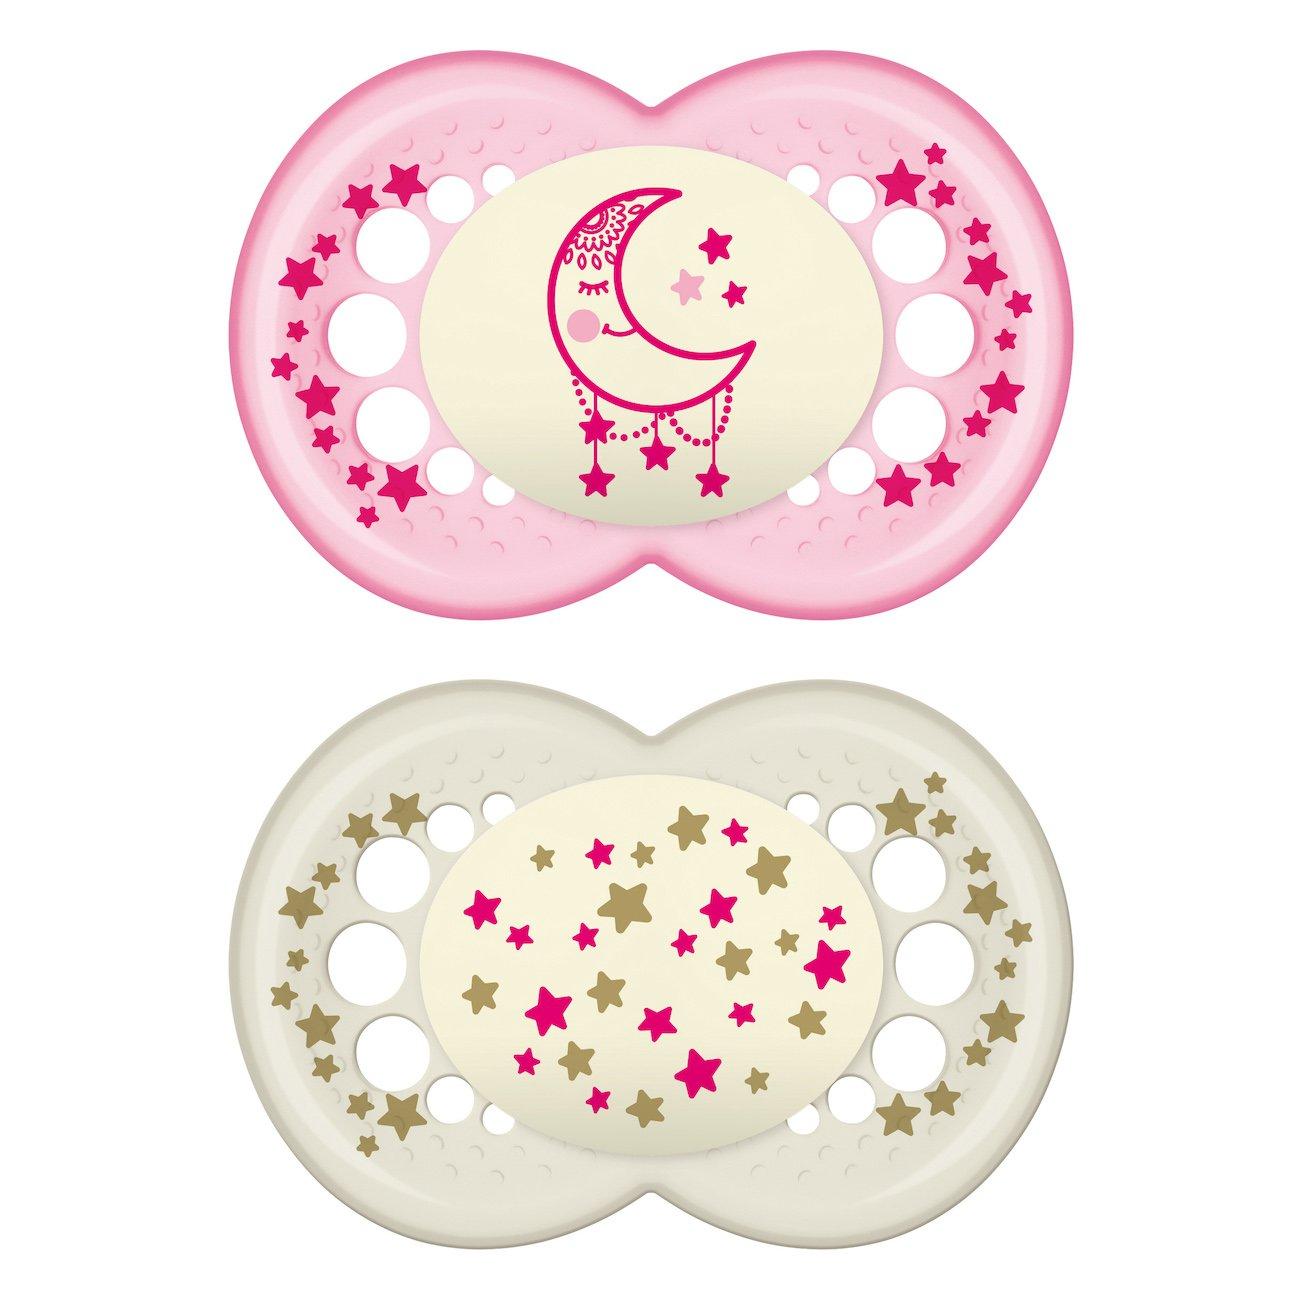 Mam Night Ορθοδοντική Πιπίλα Σιλικόνης που Λάμπει στο Σκοτάδι Κωδ 260S από 16+ Μηνών 2 Τεμάχια – Ροζ – Λευκό